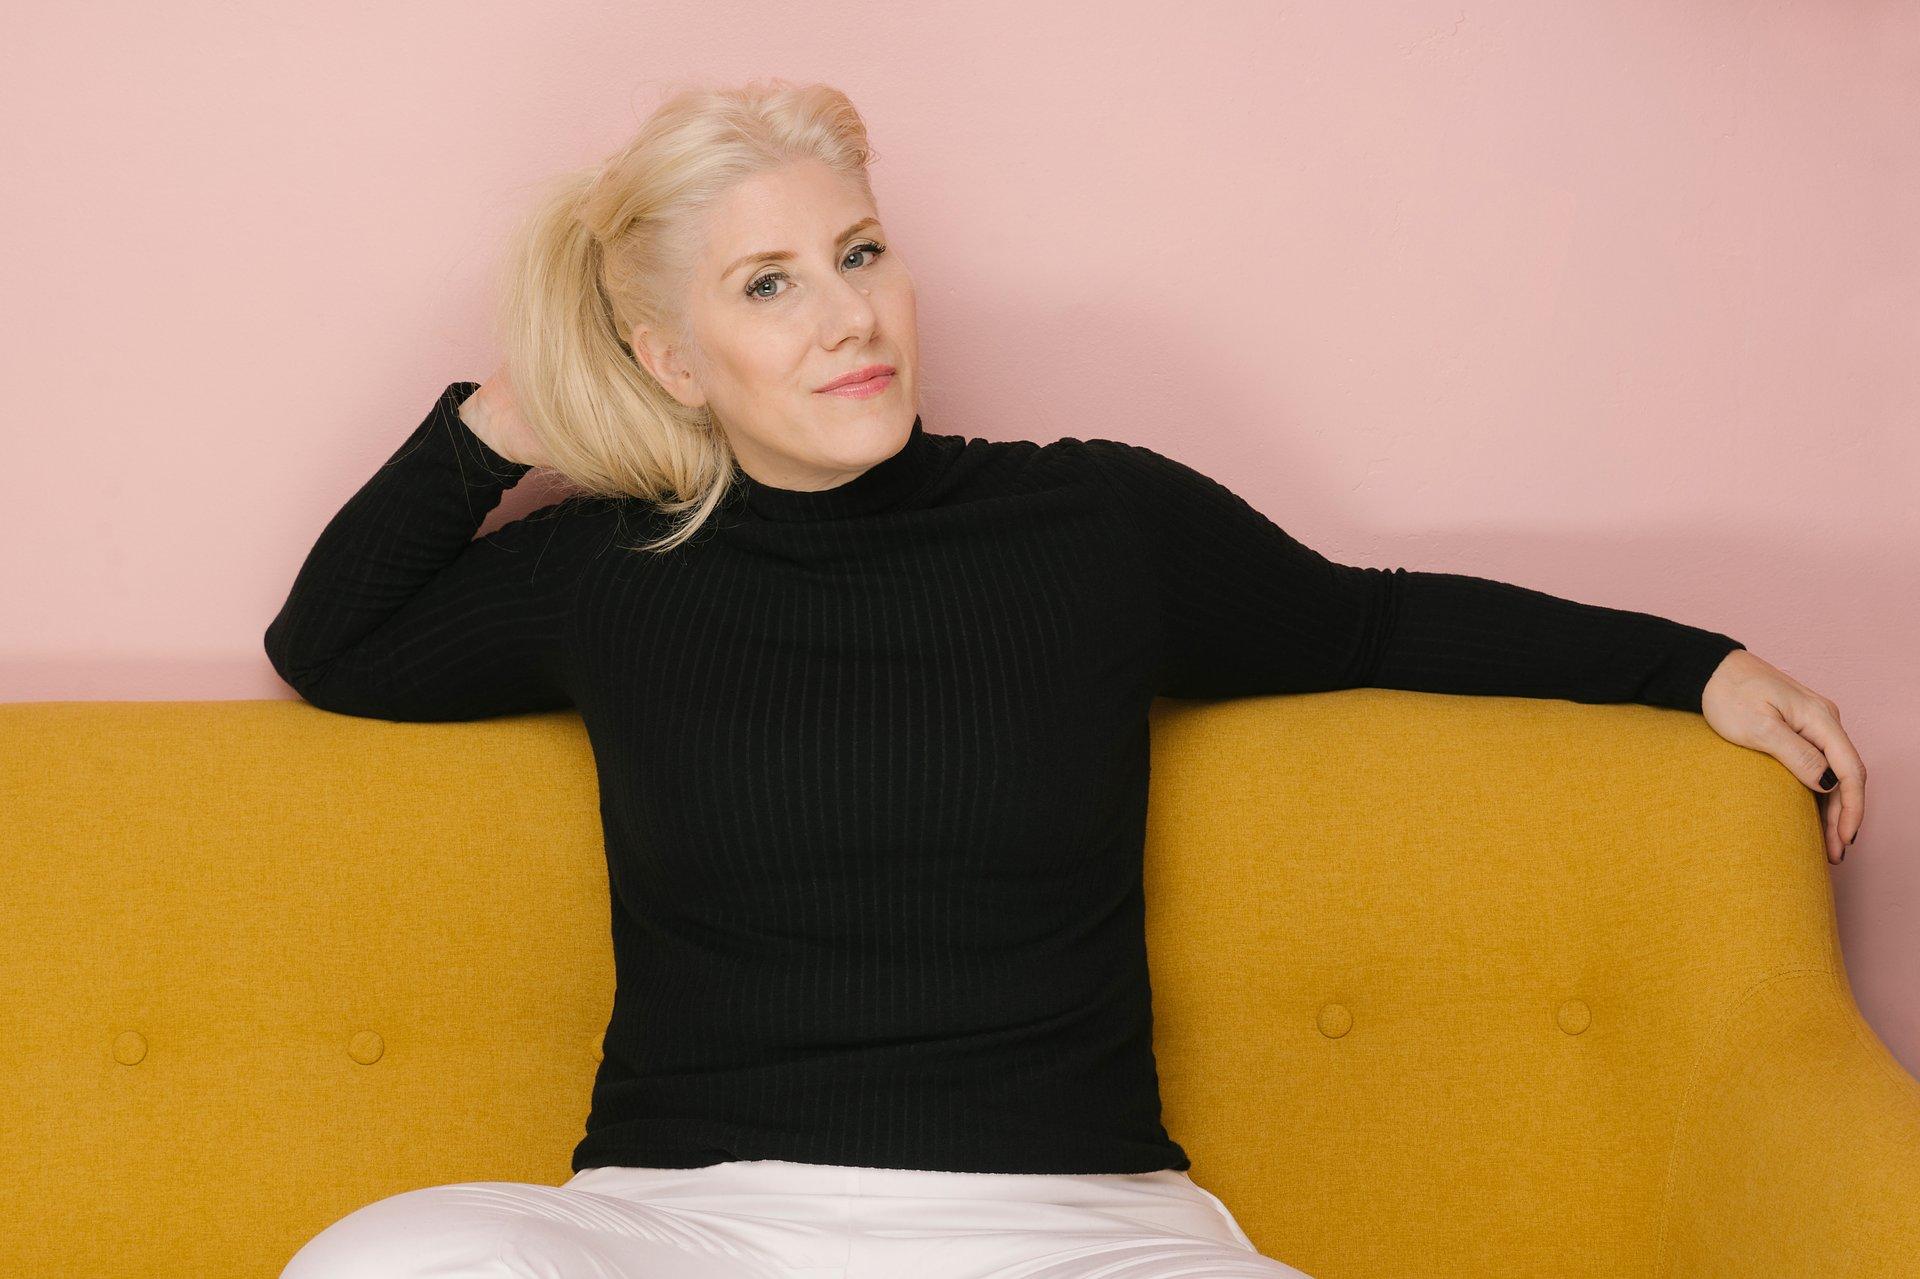 Kat Corbett Brings New Music Every Friday on Loop App